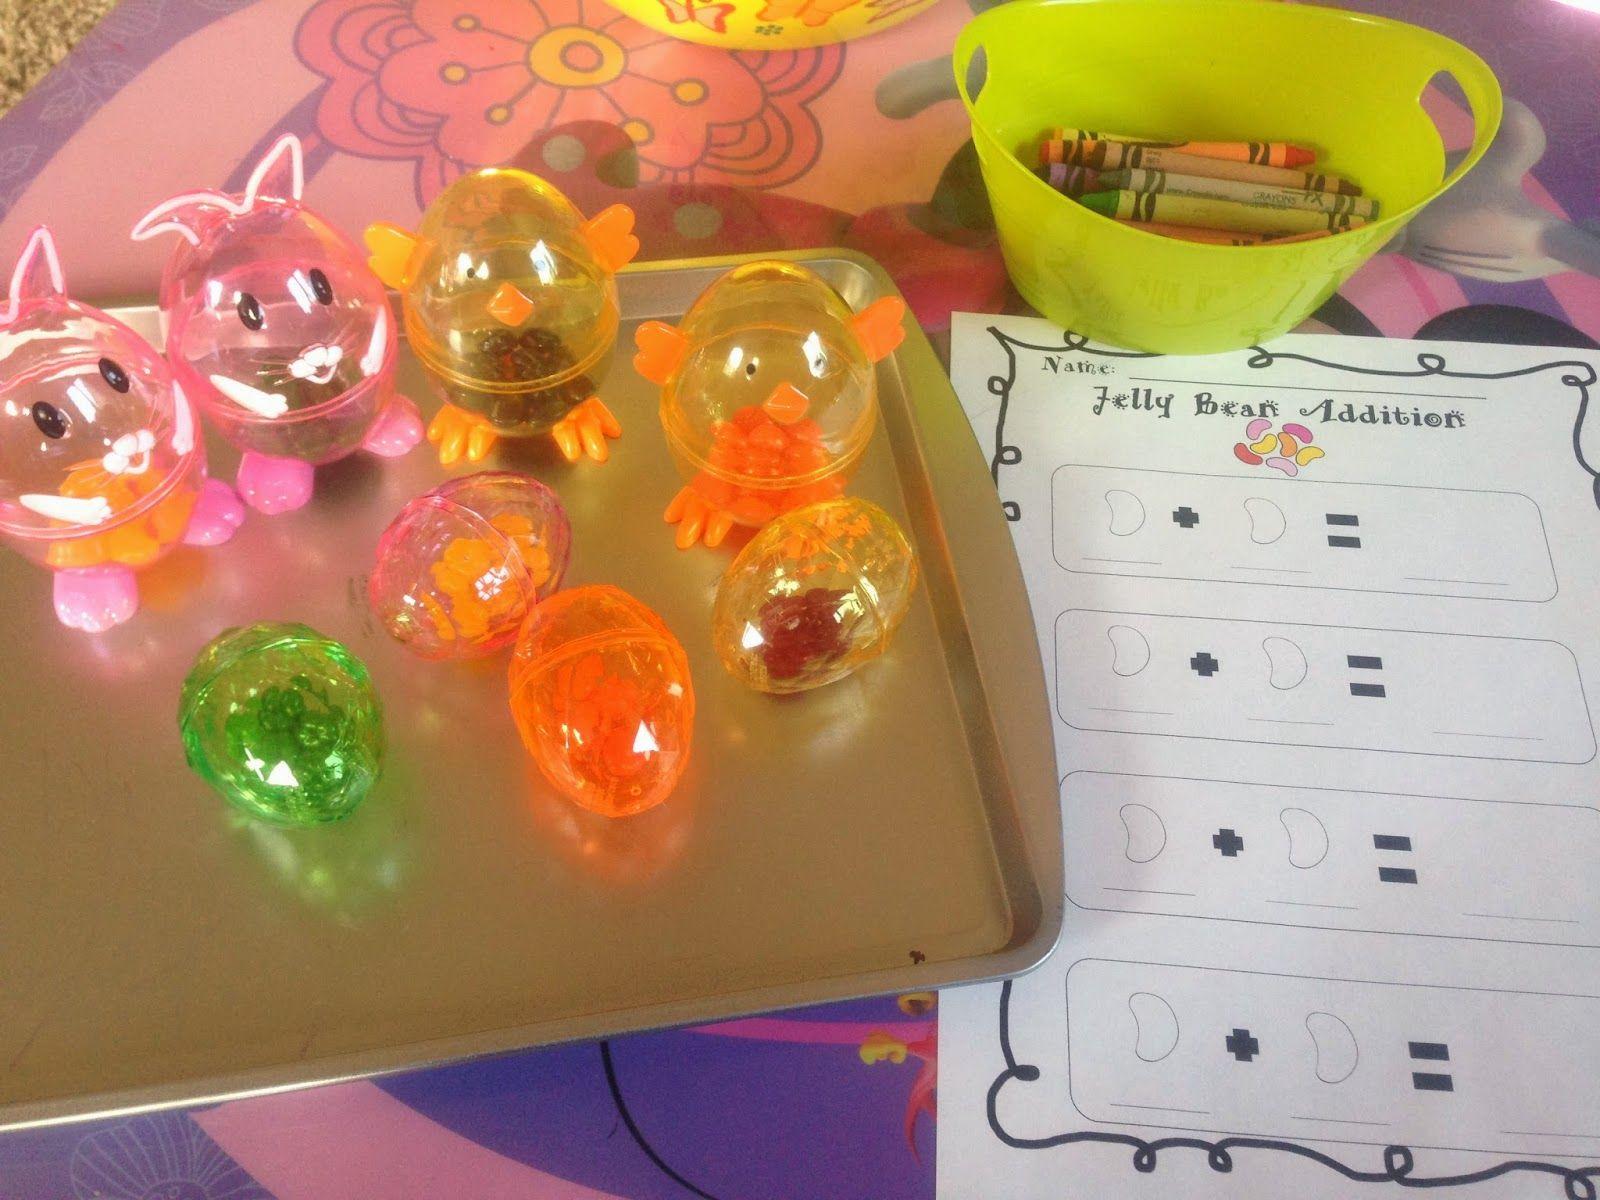 Teaching Munchkins Jelly Bean Addition